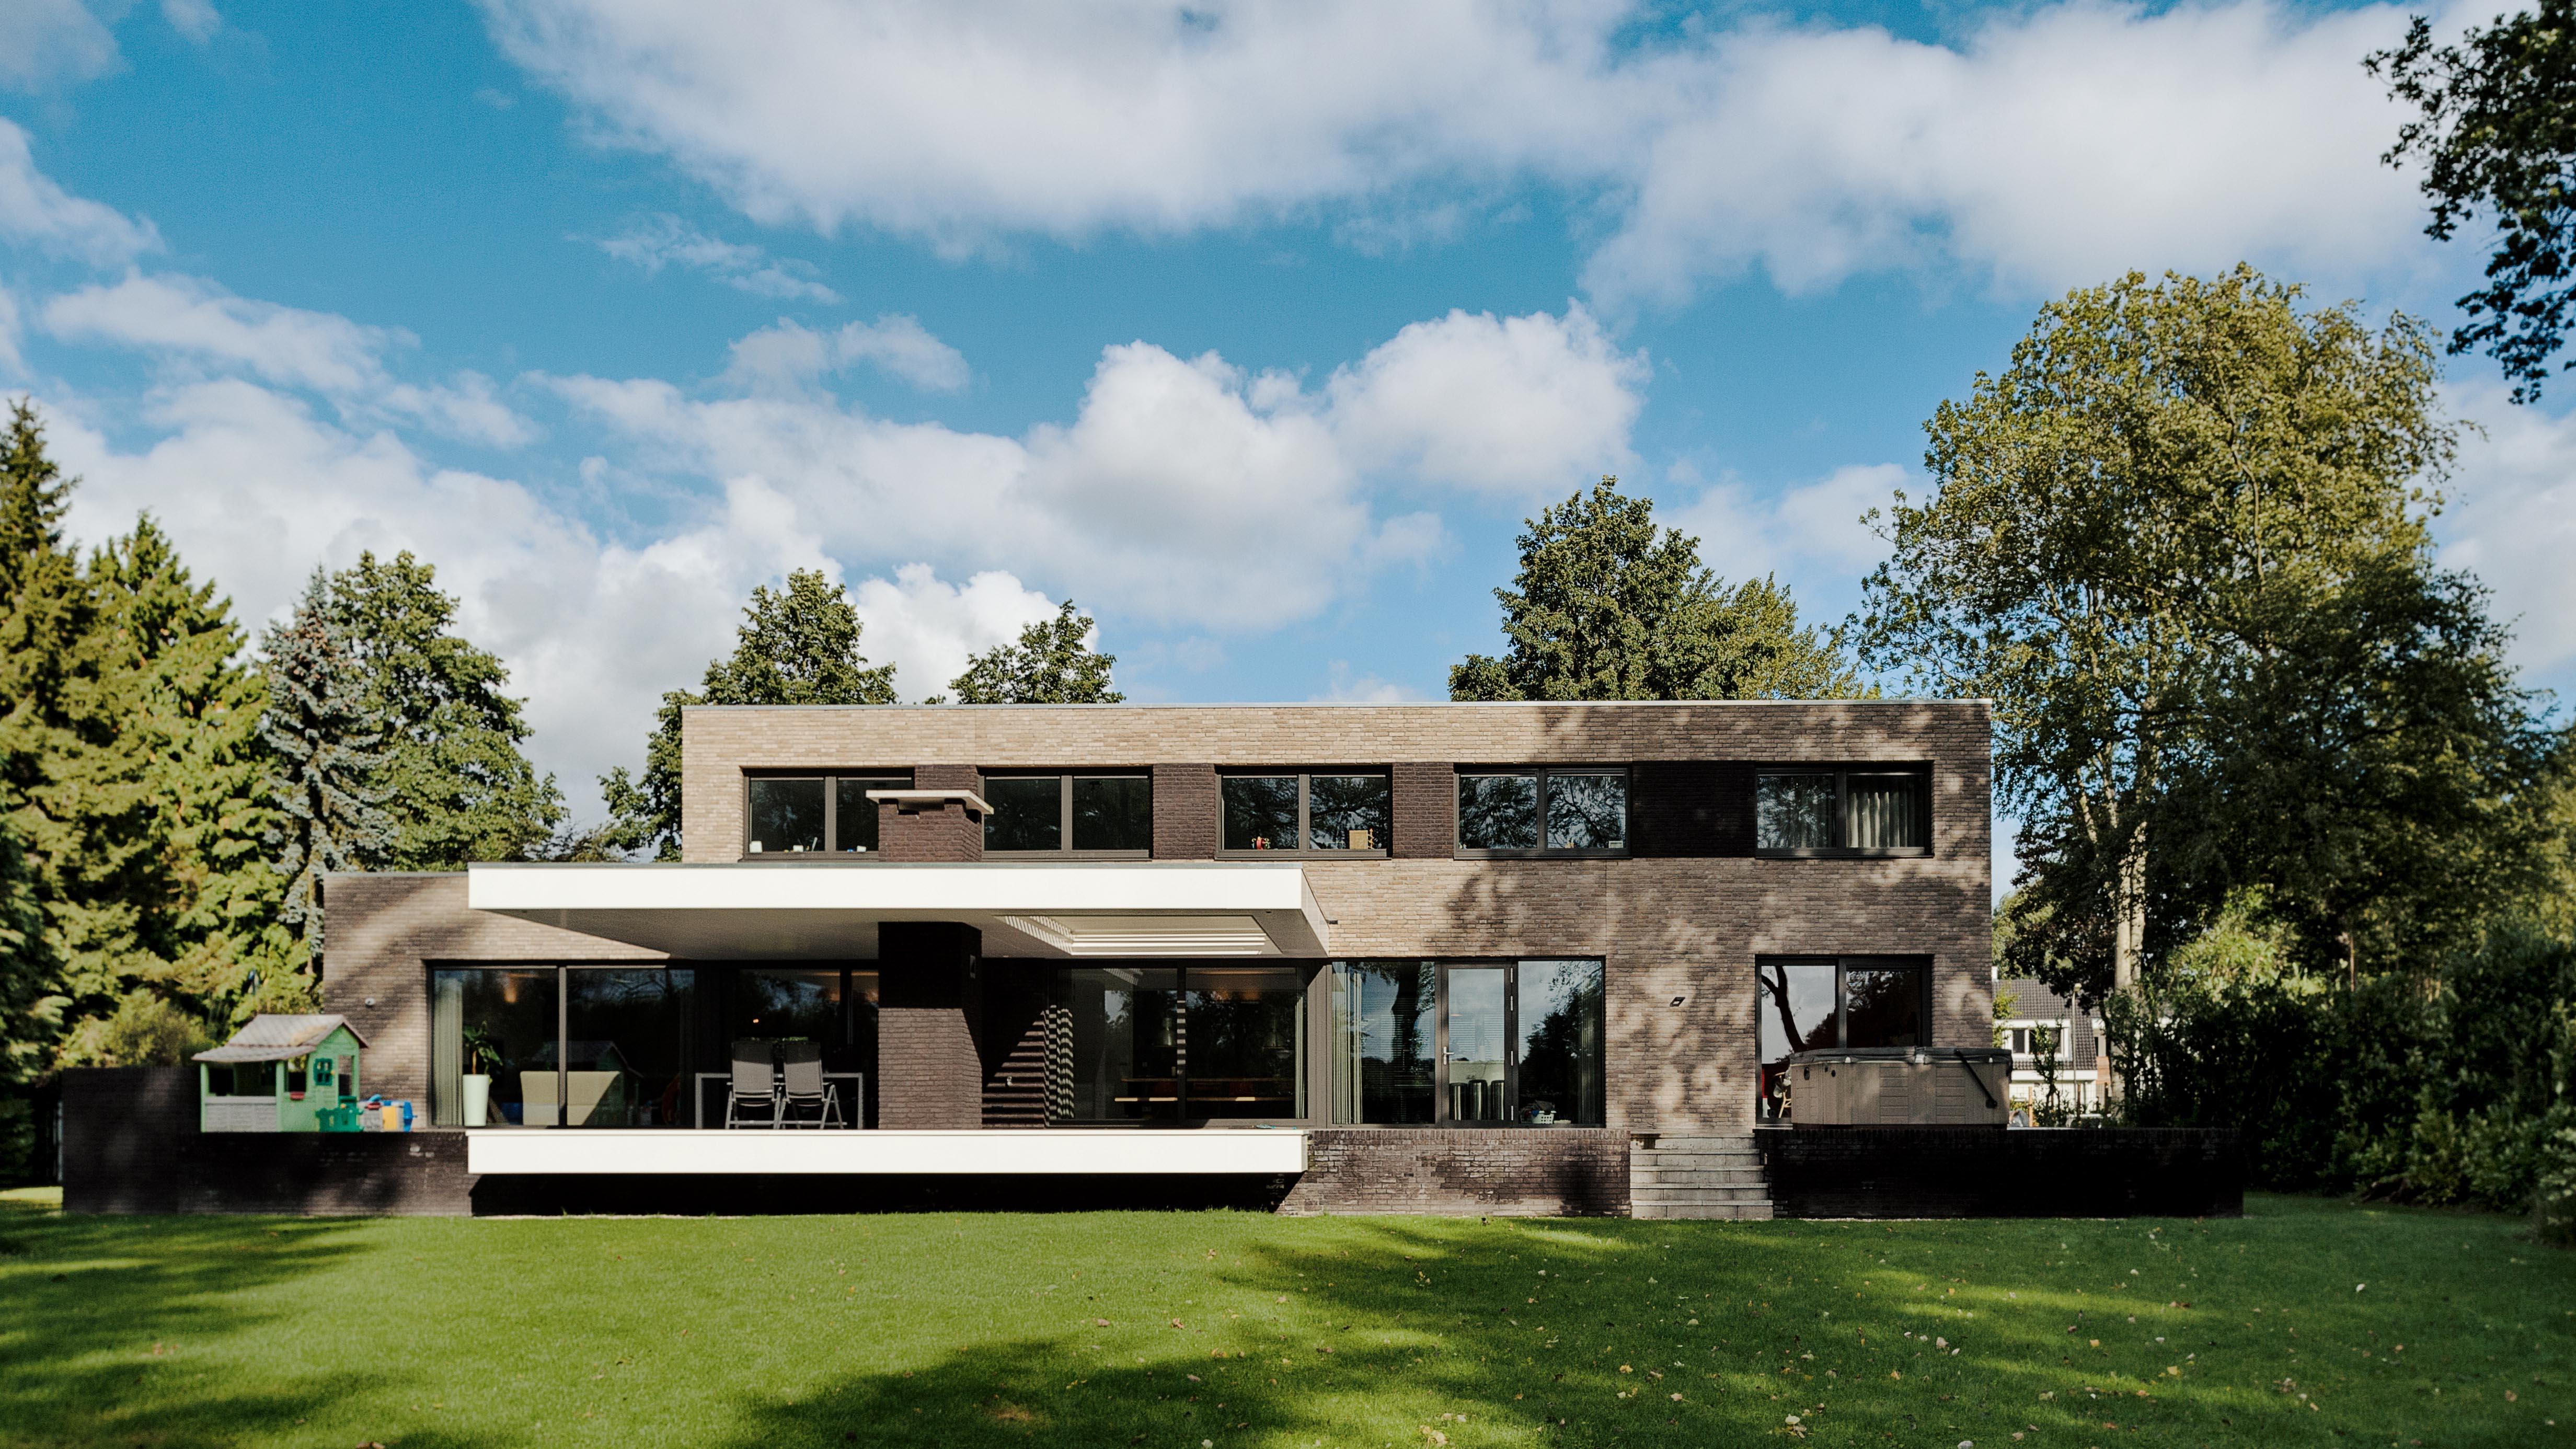 FPF_20170913_BB_Architecten_Valentijnlaan_Breda016_pano